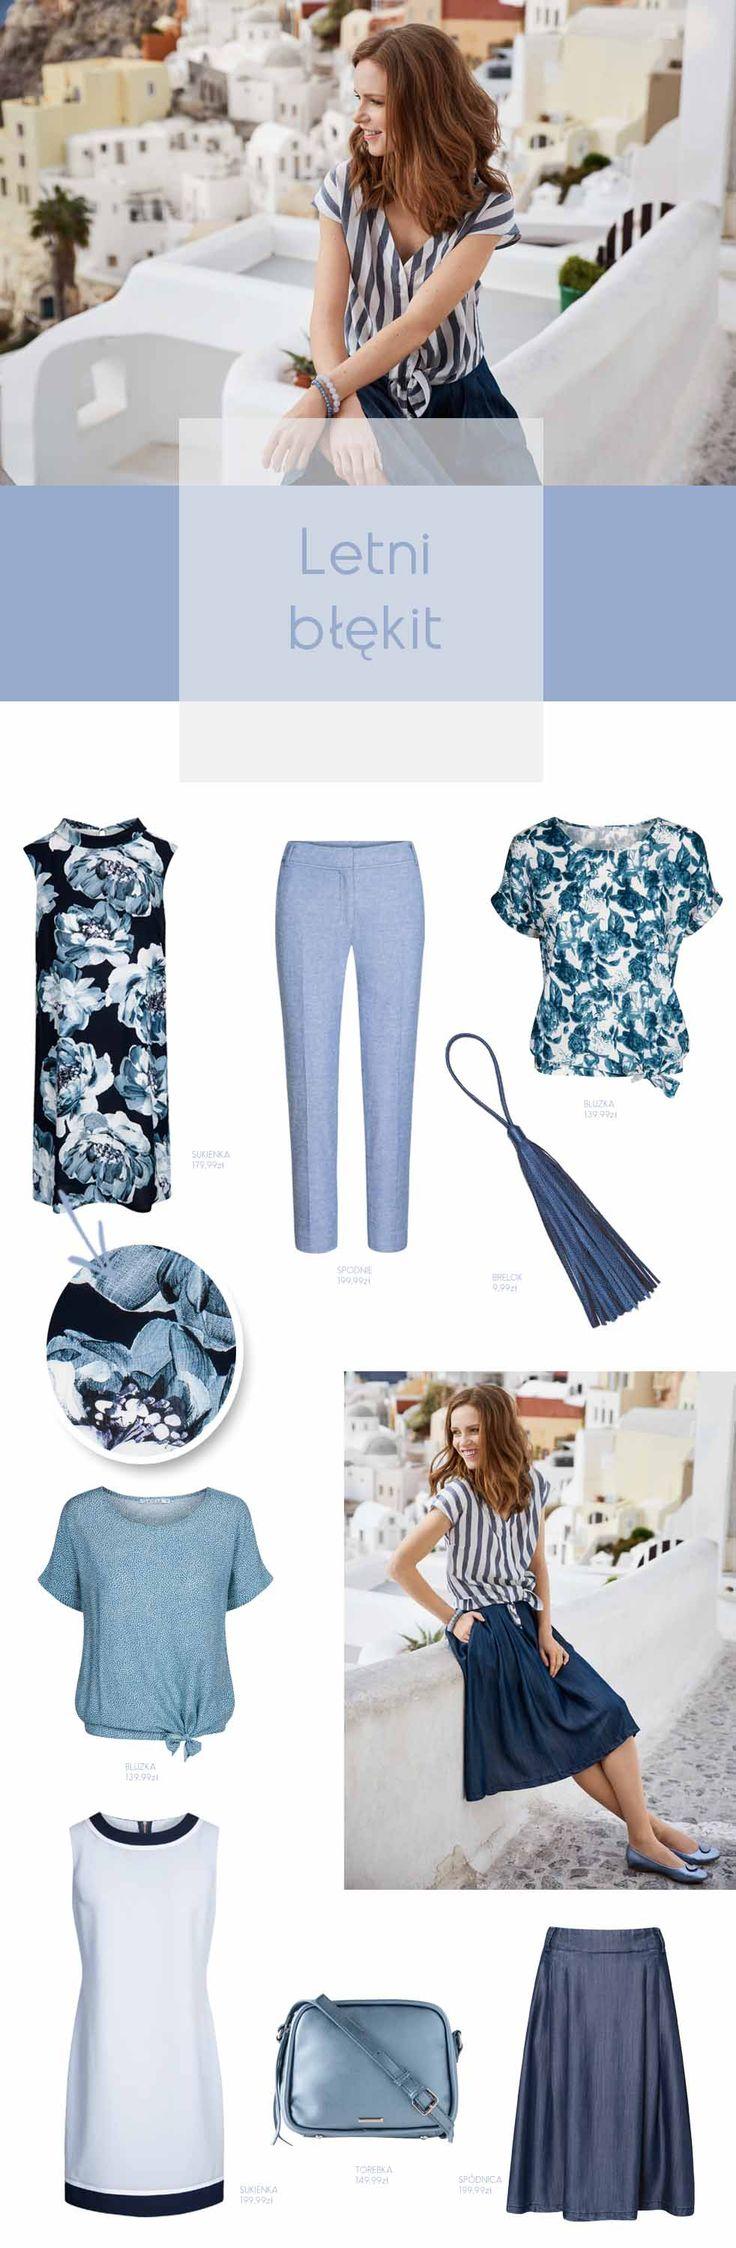 #quiosquepl #quiosque #newseason #woman #lady #style #outfit #ootd #feminine #kobieco #womanwear #trends #inspirations #fashion #polishfashion #polishbrand